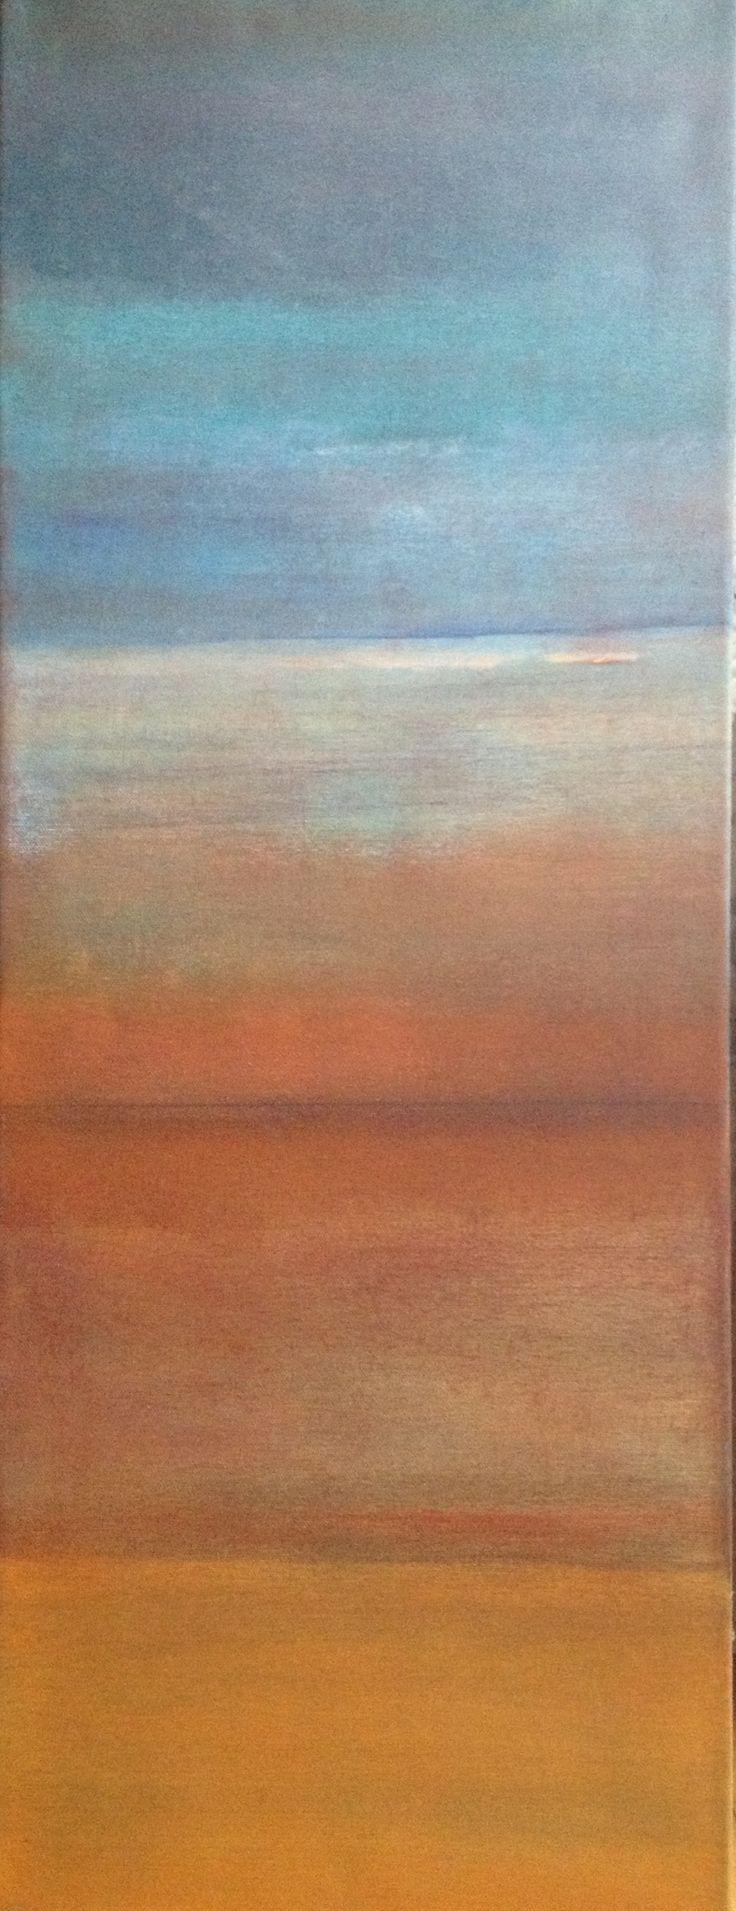 "'Earth, Sea, Sky' by Marg Rehnberg | $250 | 12""w x 32""h | Original Art | http://www.arttwo50.com/buy/art/earth-sea-sky--2"